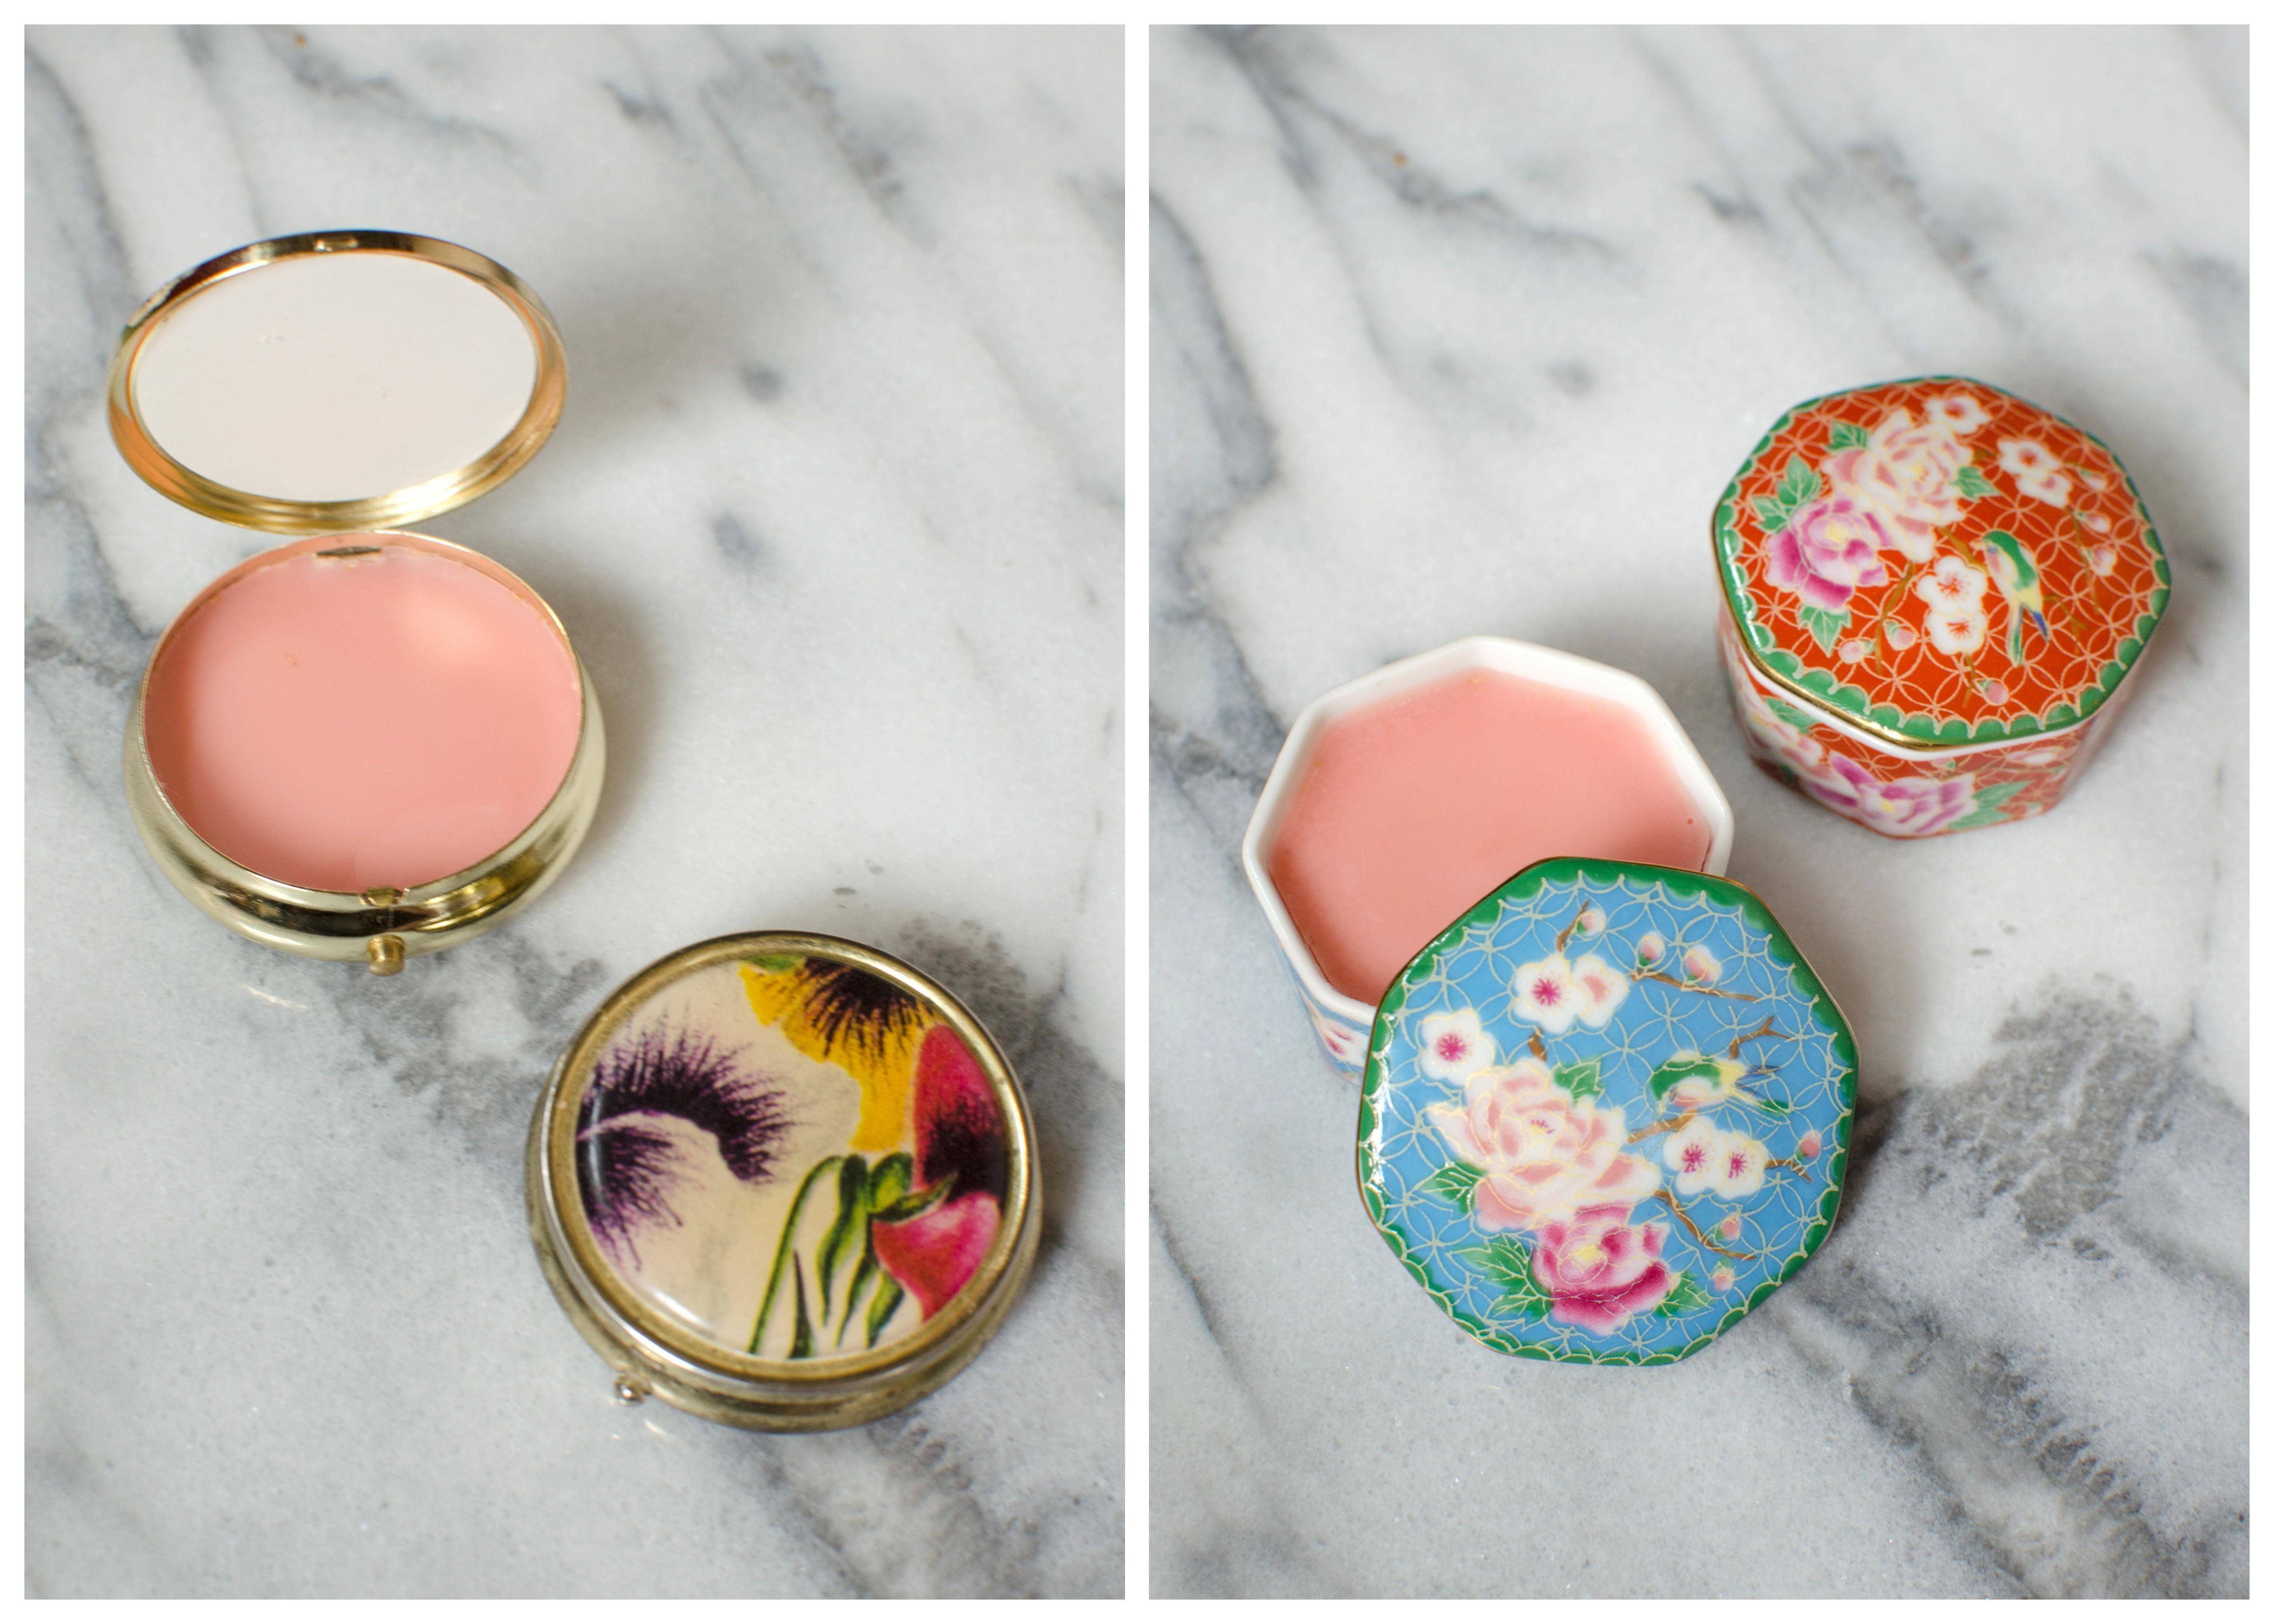 DIY Homemade Lip Balm in Vintage Pillboxes